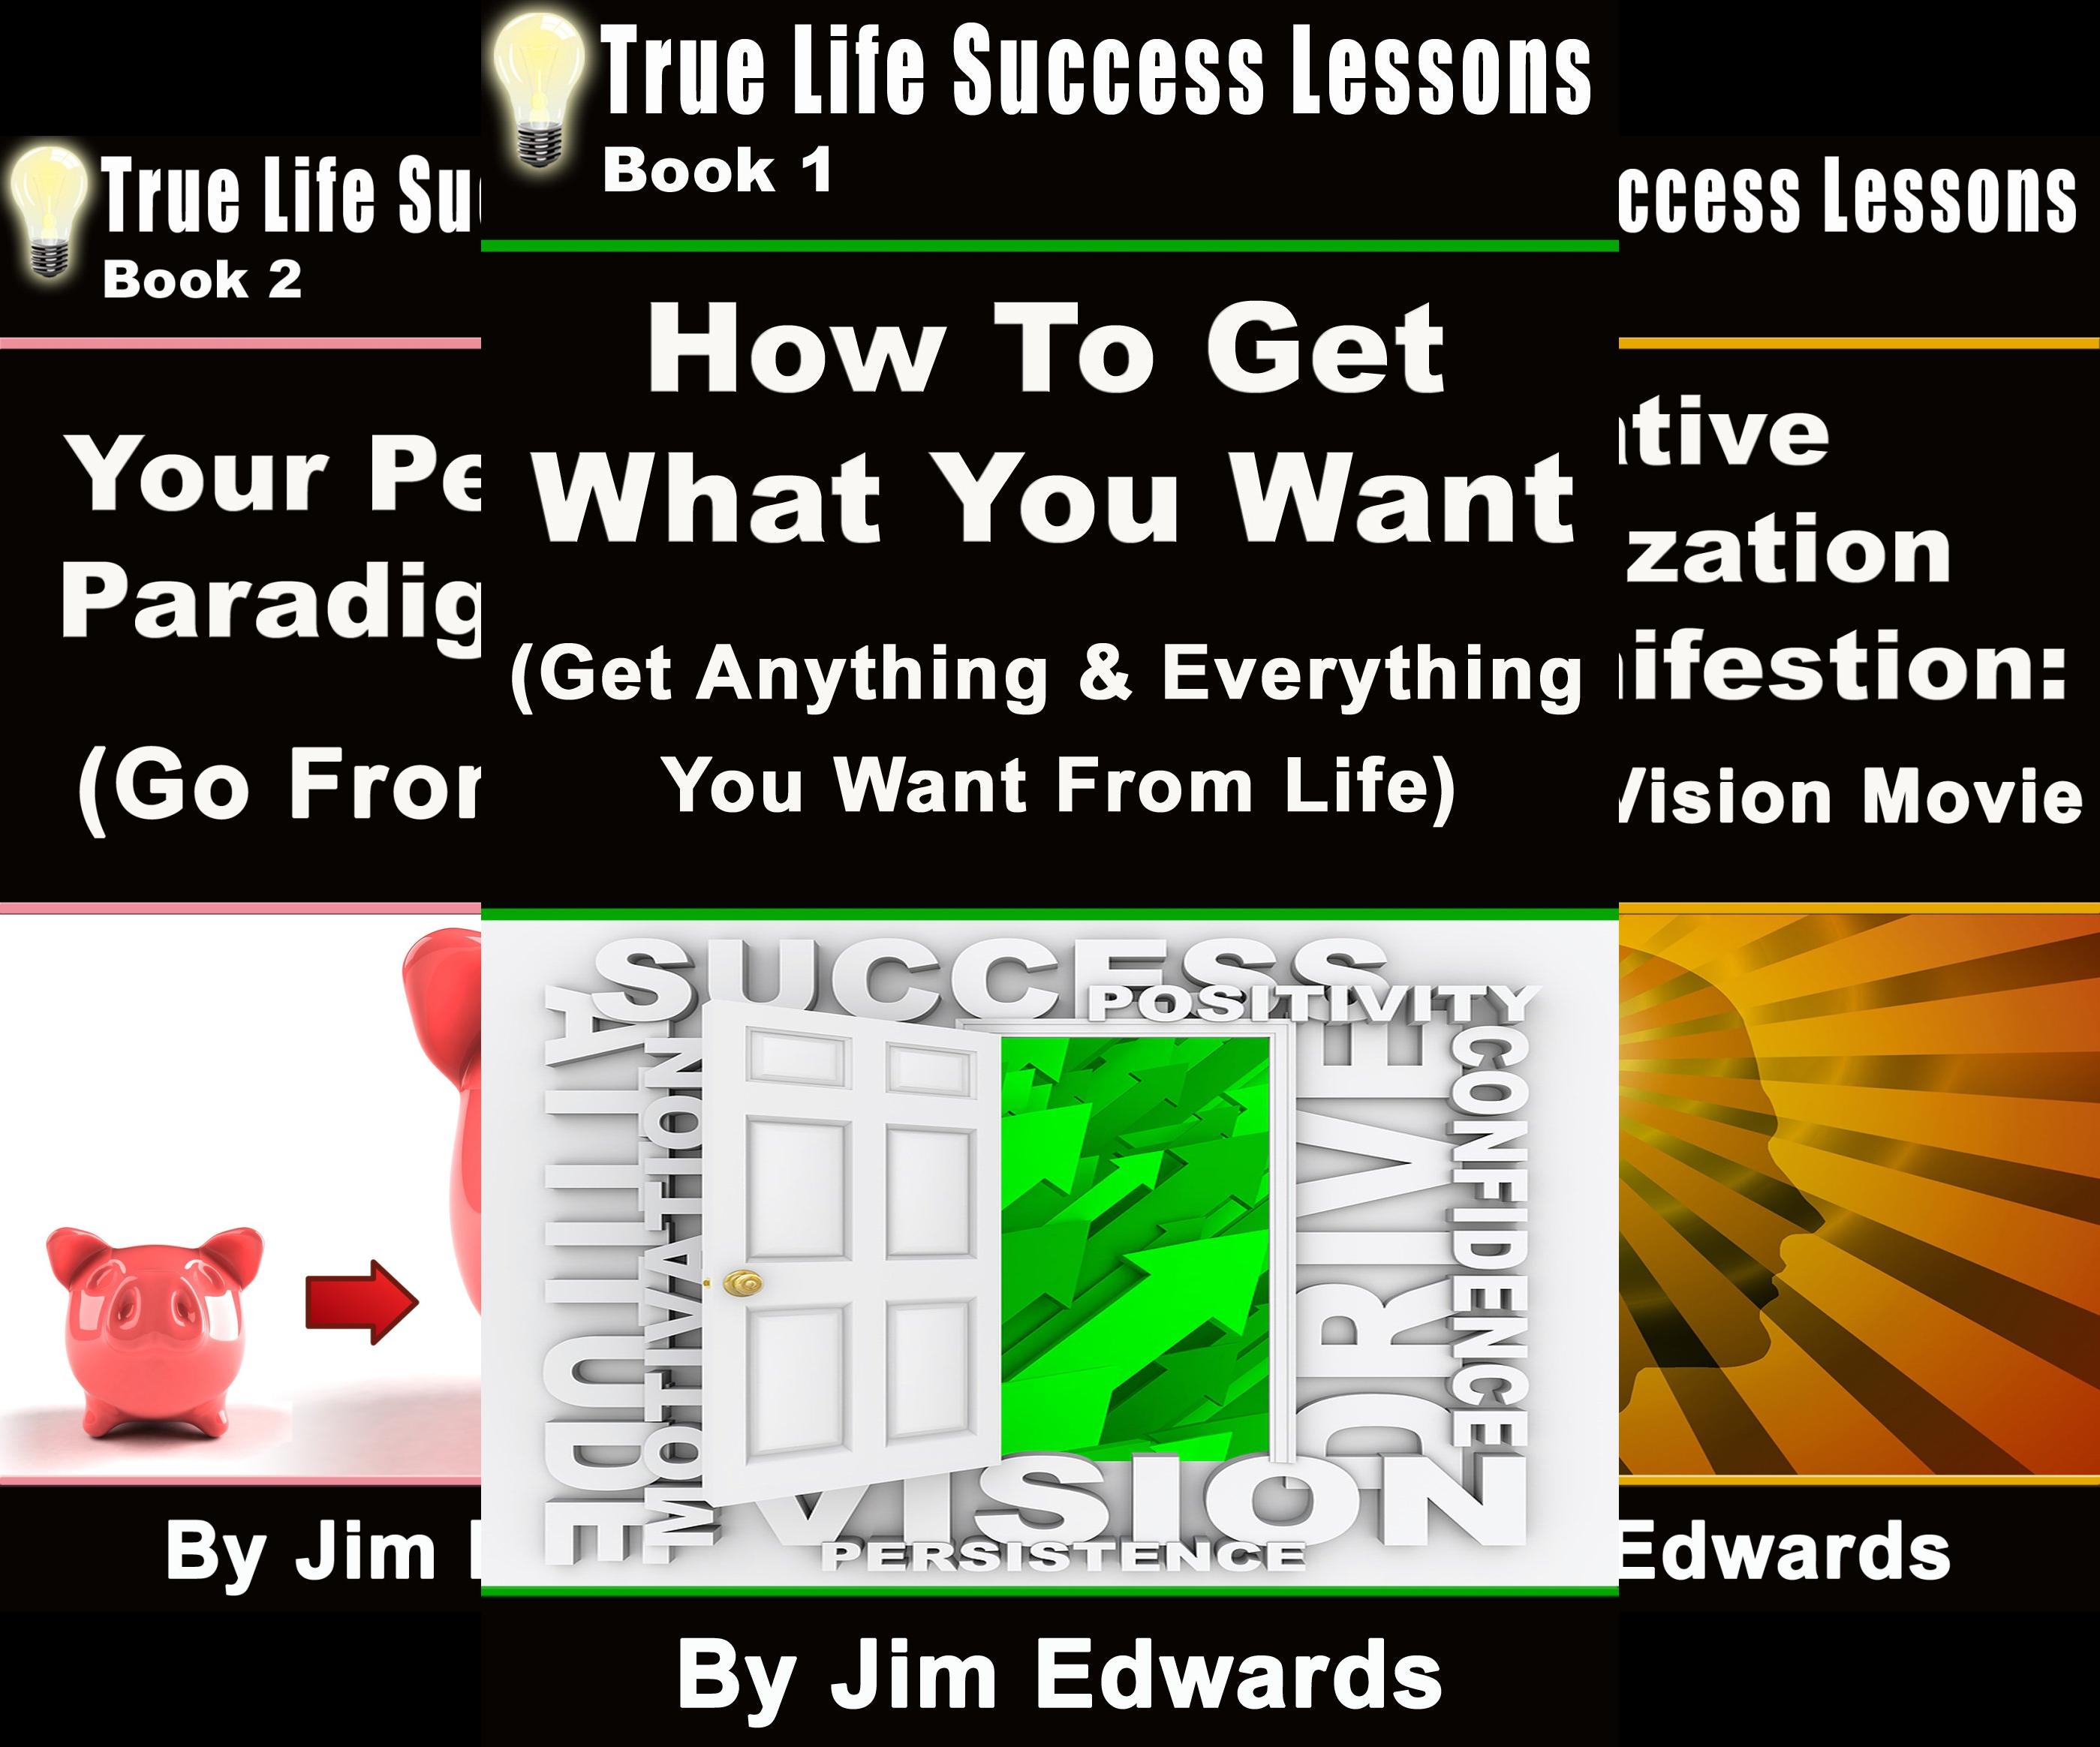 True Life Success Lessons (12 Book Series)